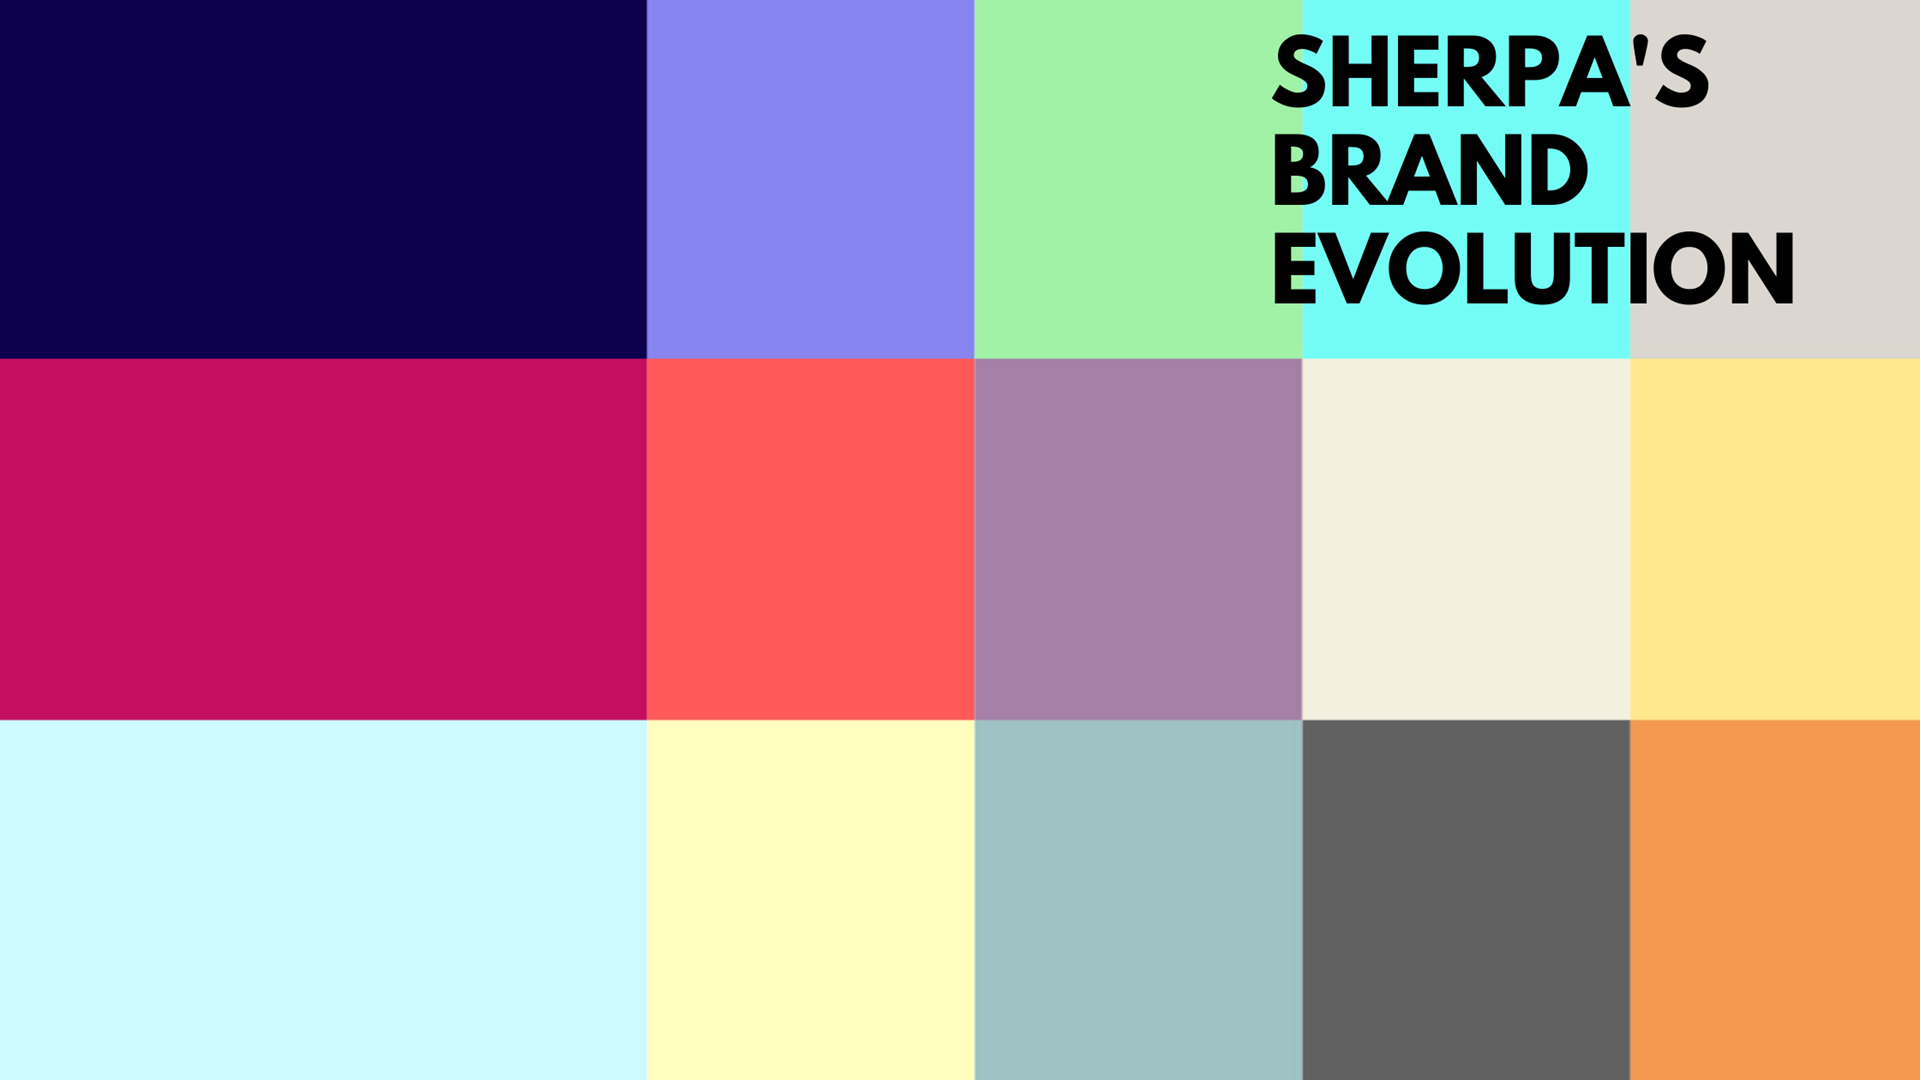 Edge Summer 2020: Sherpa's Brand Evolution